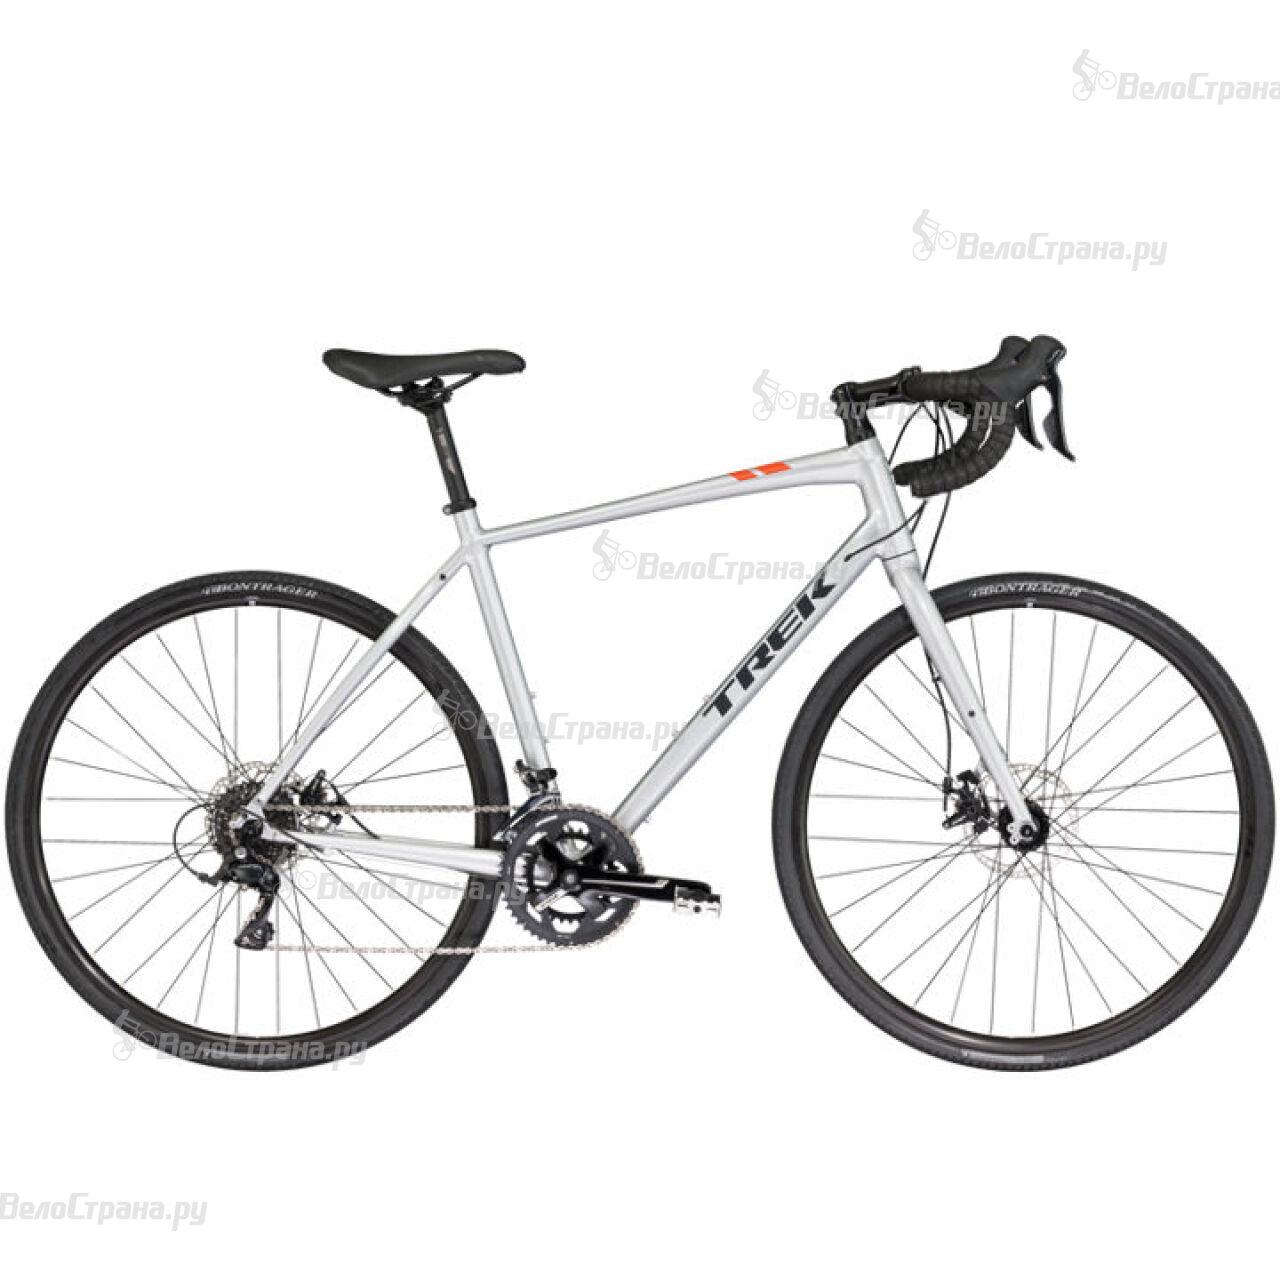 Велосипед Trek CrossRip 1 (2017) велосипед trek crossrip 2013